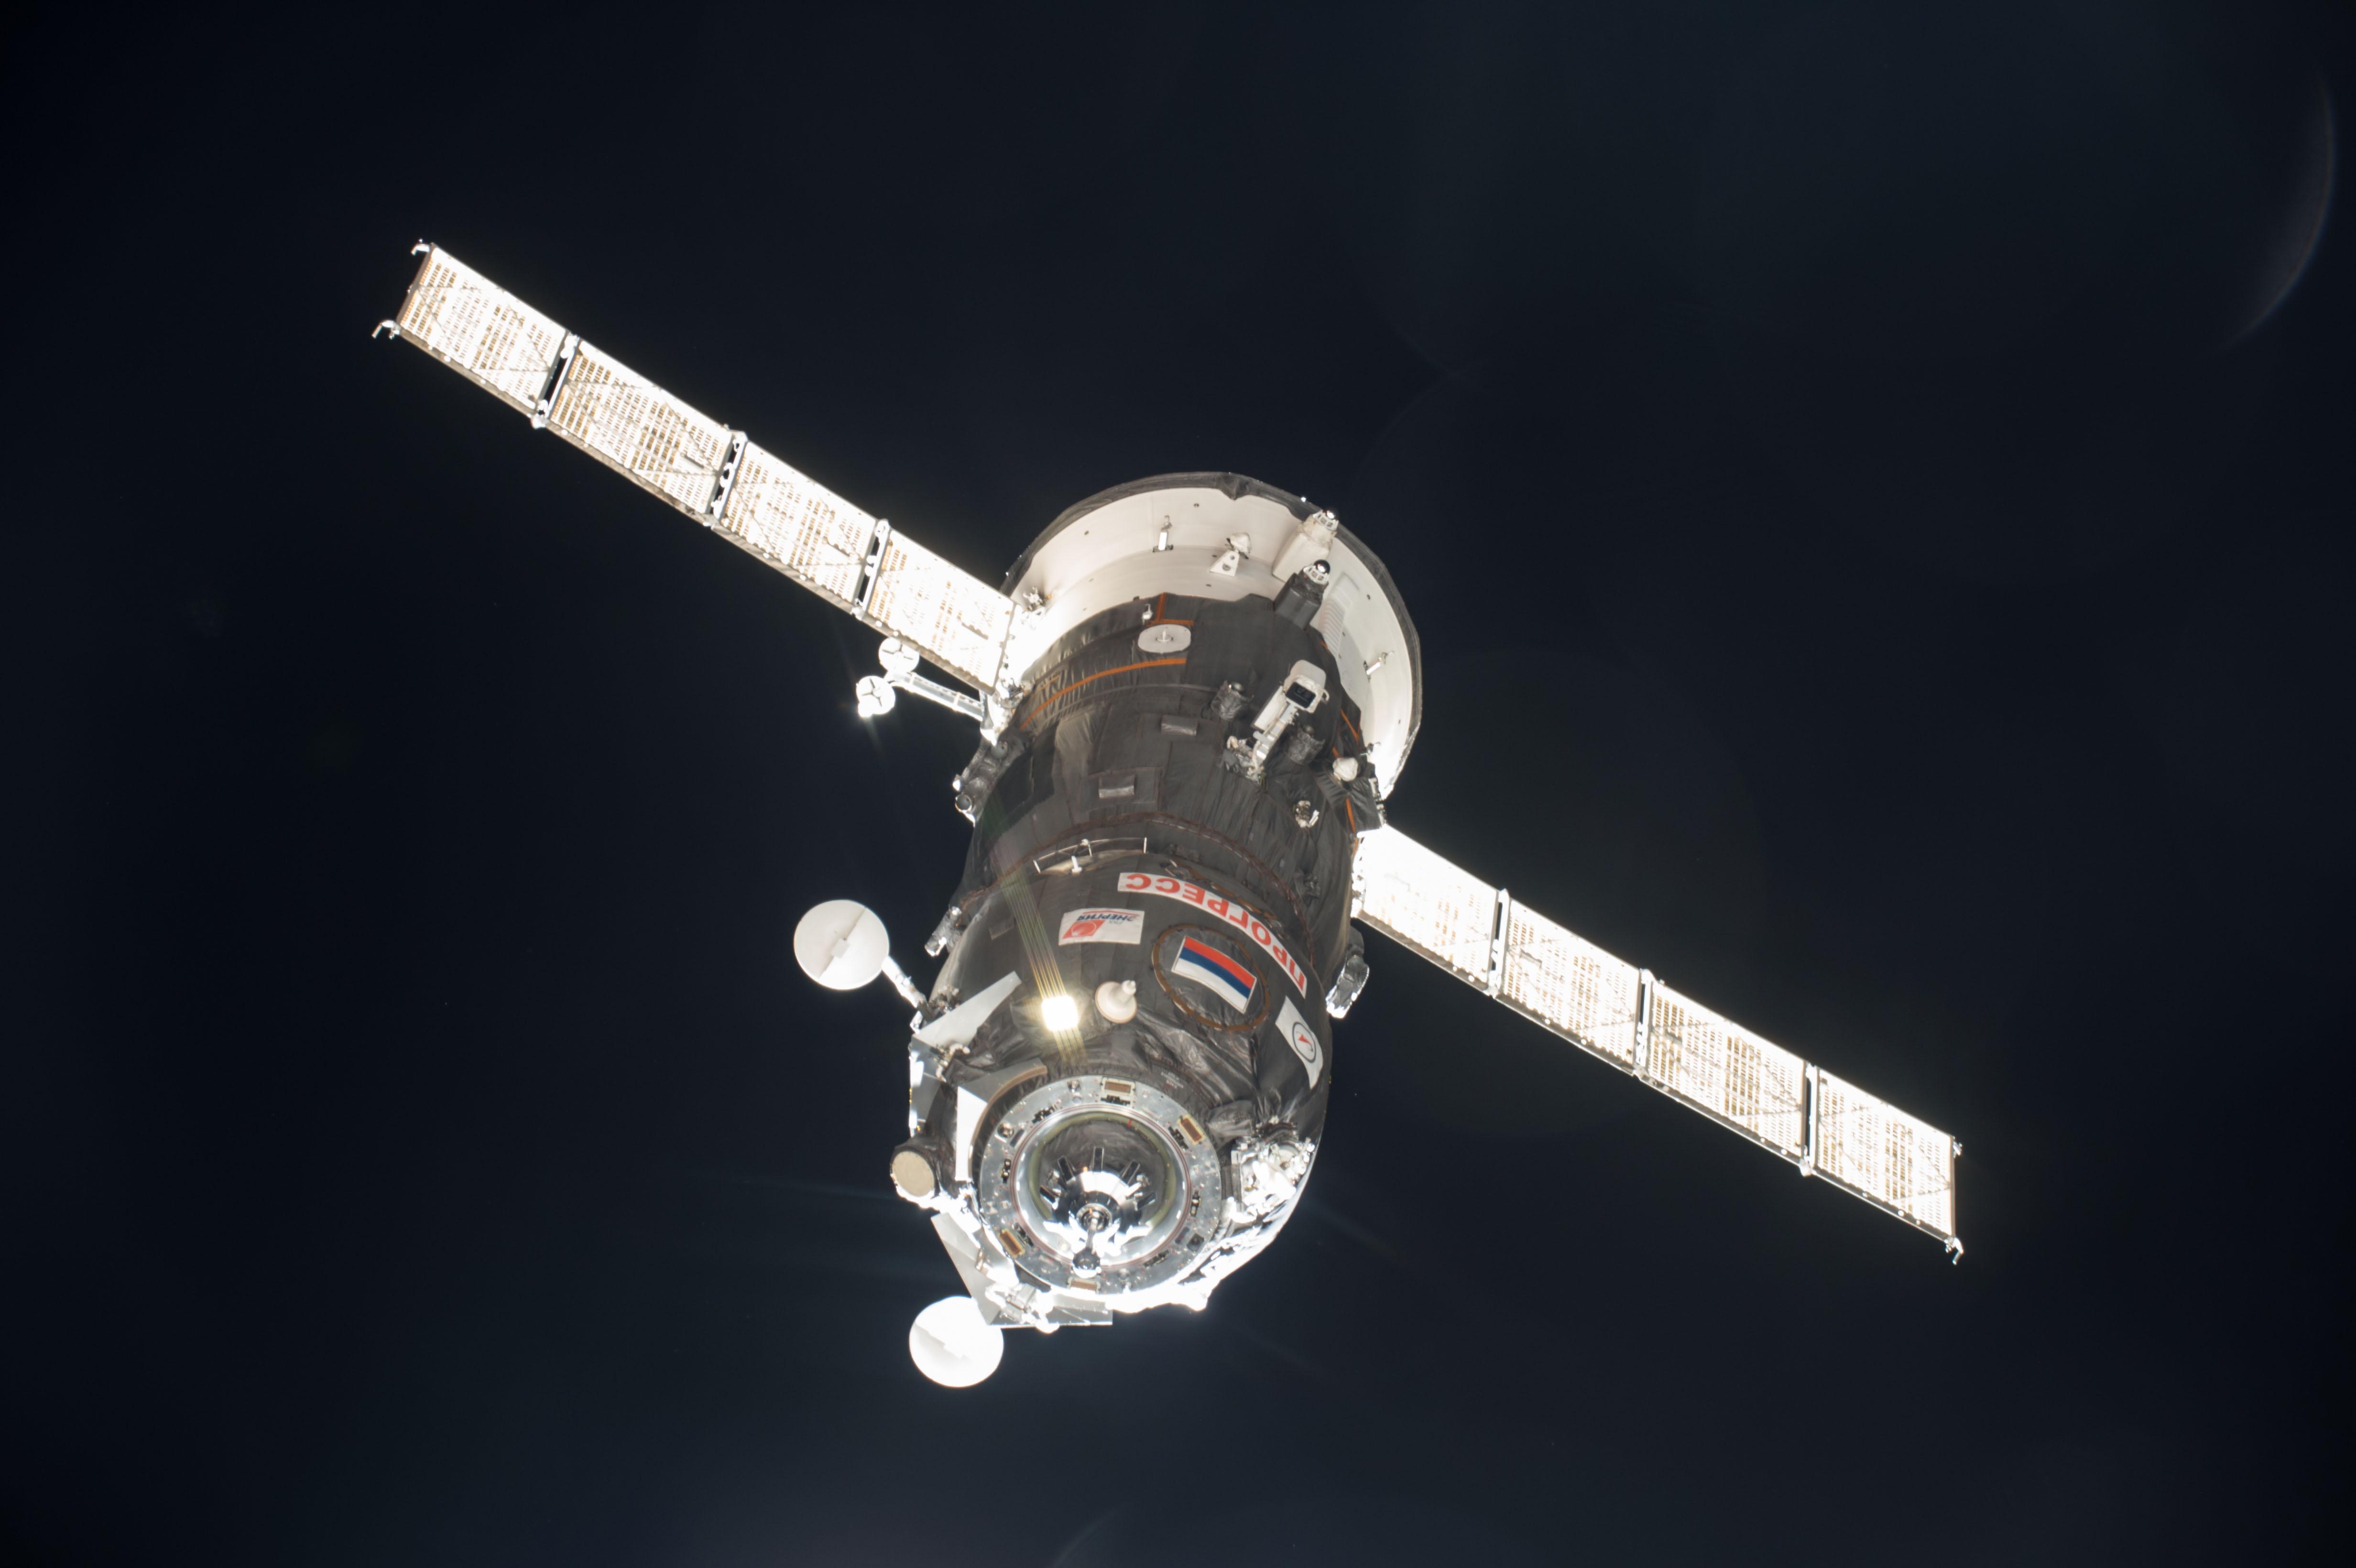 tv spacecraft - photo #12